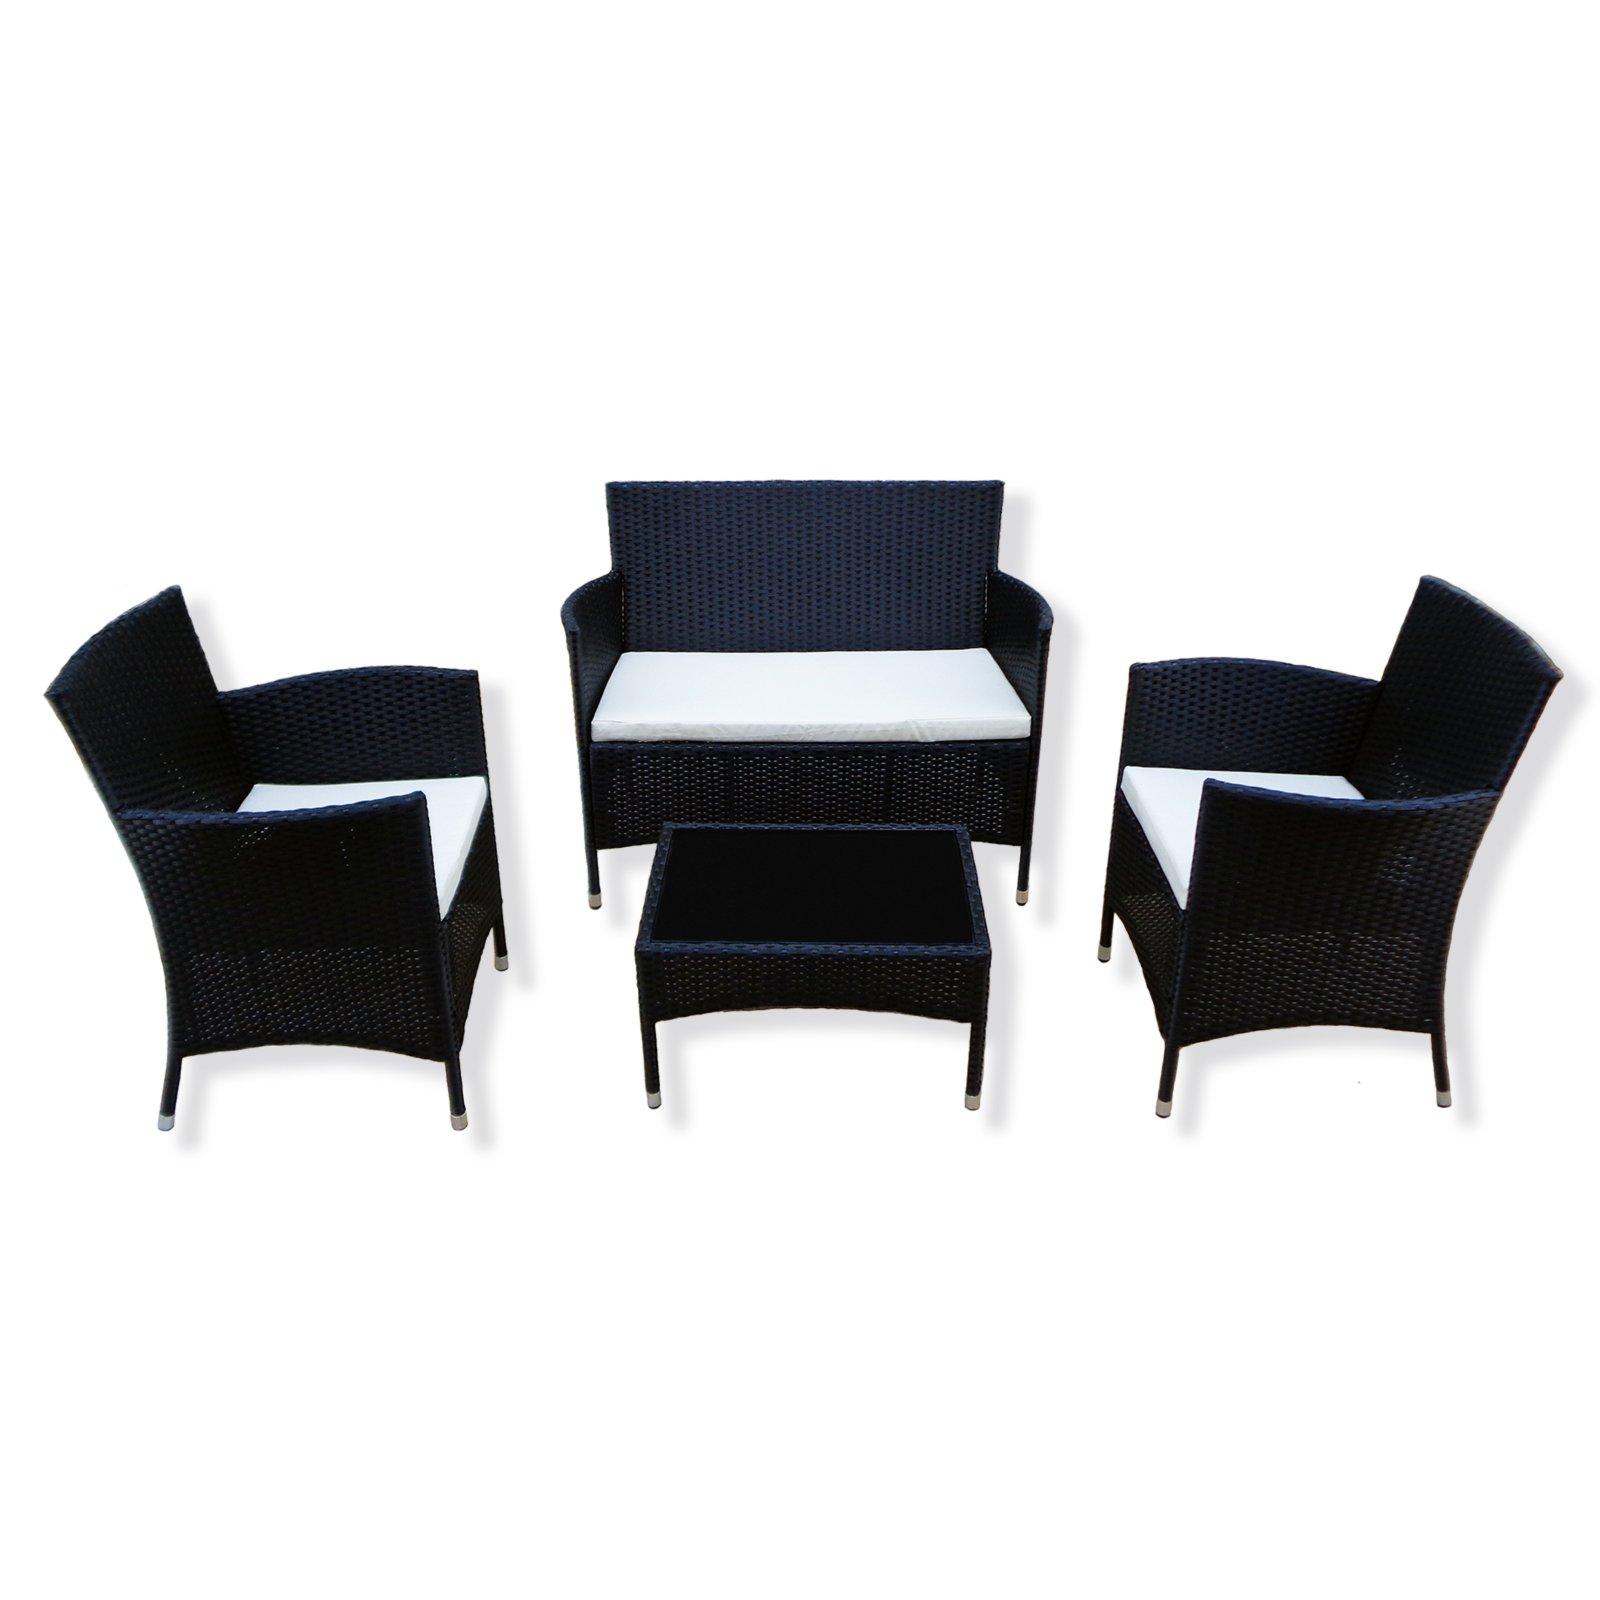 gardiola garten sitzgruppe sirmione ii schwarz rattanopitk gartenm bel sets gartenm bel. Black Bedroom Furniture Sets. Home Design Ideas